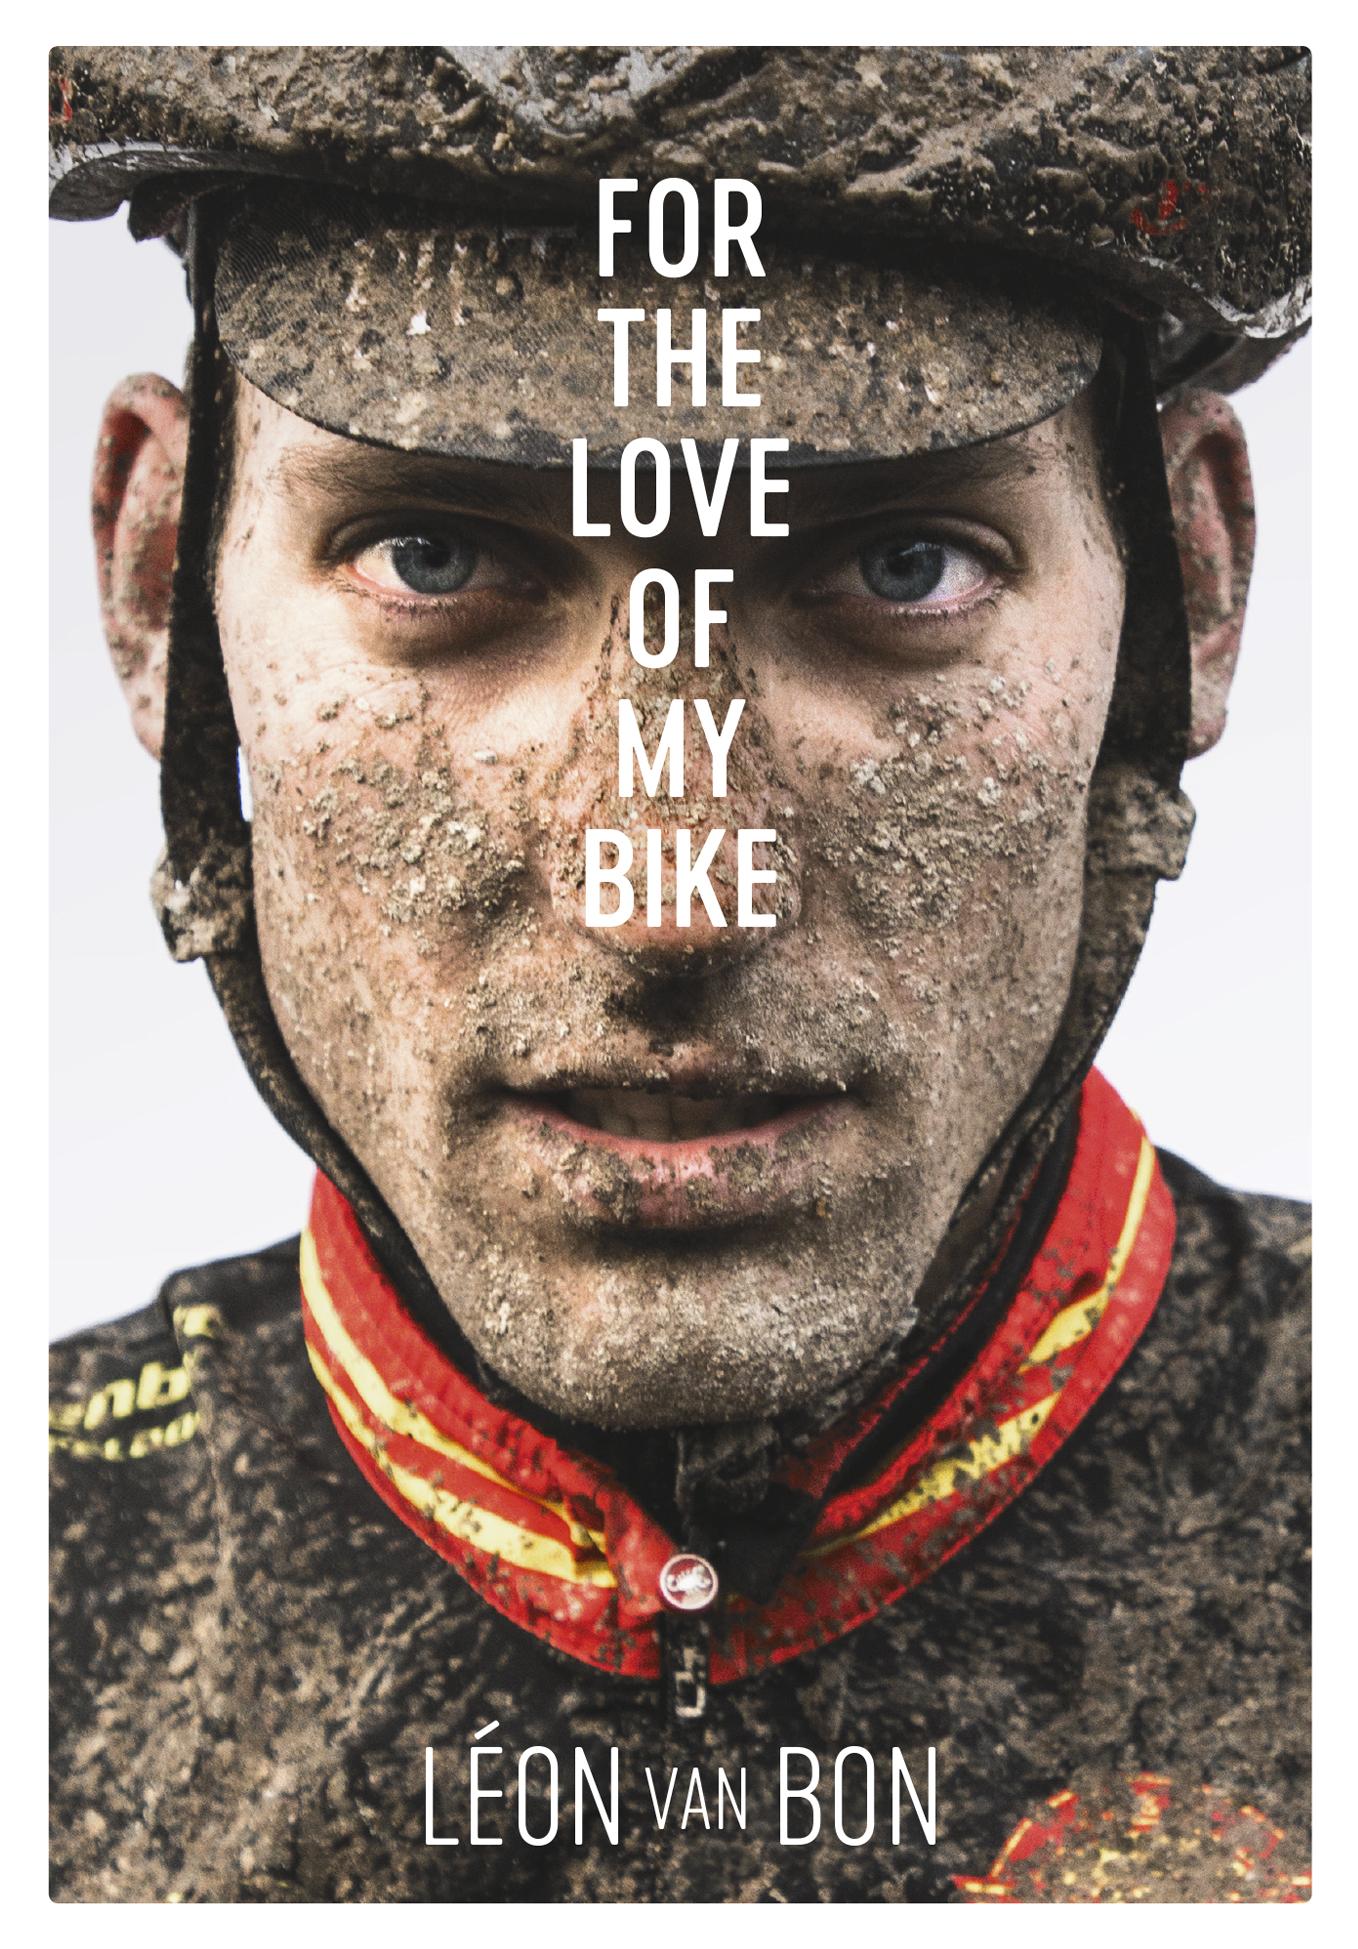 For the love of my bike - Léon van Bon